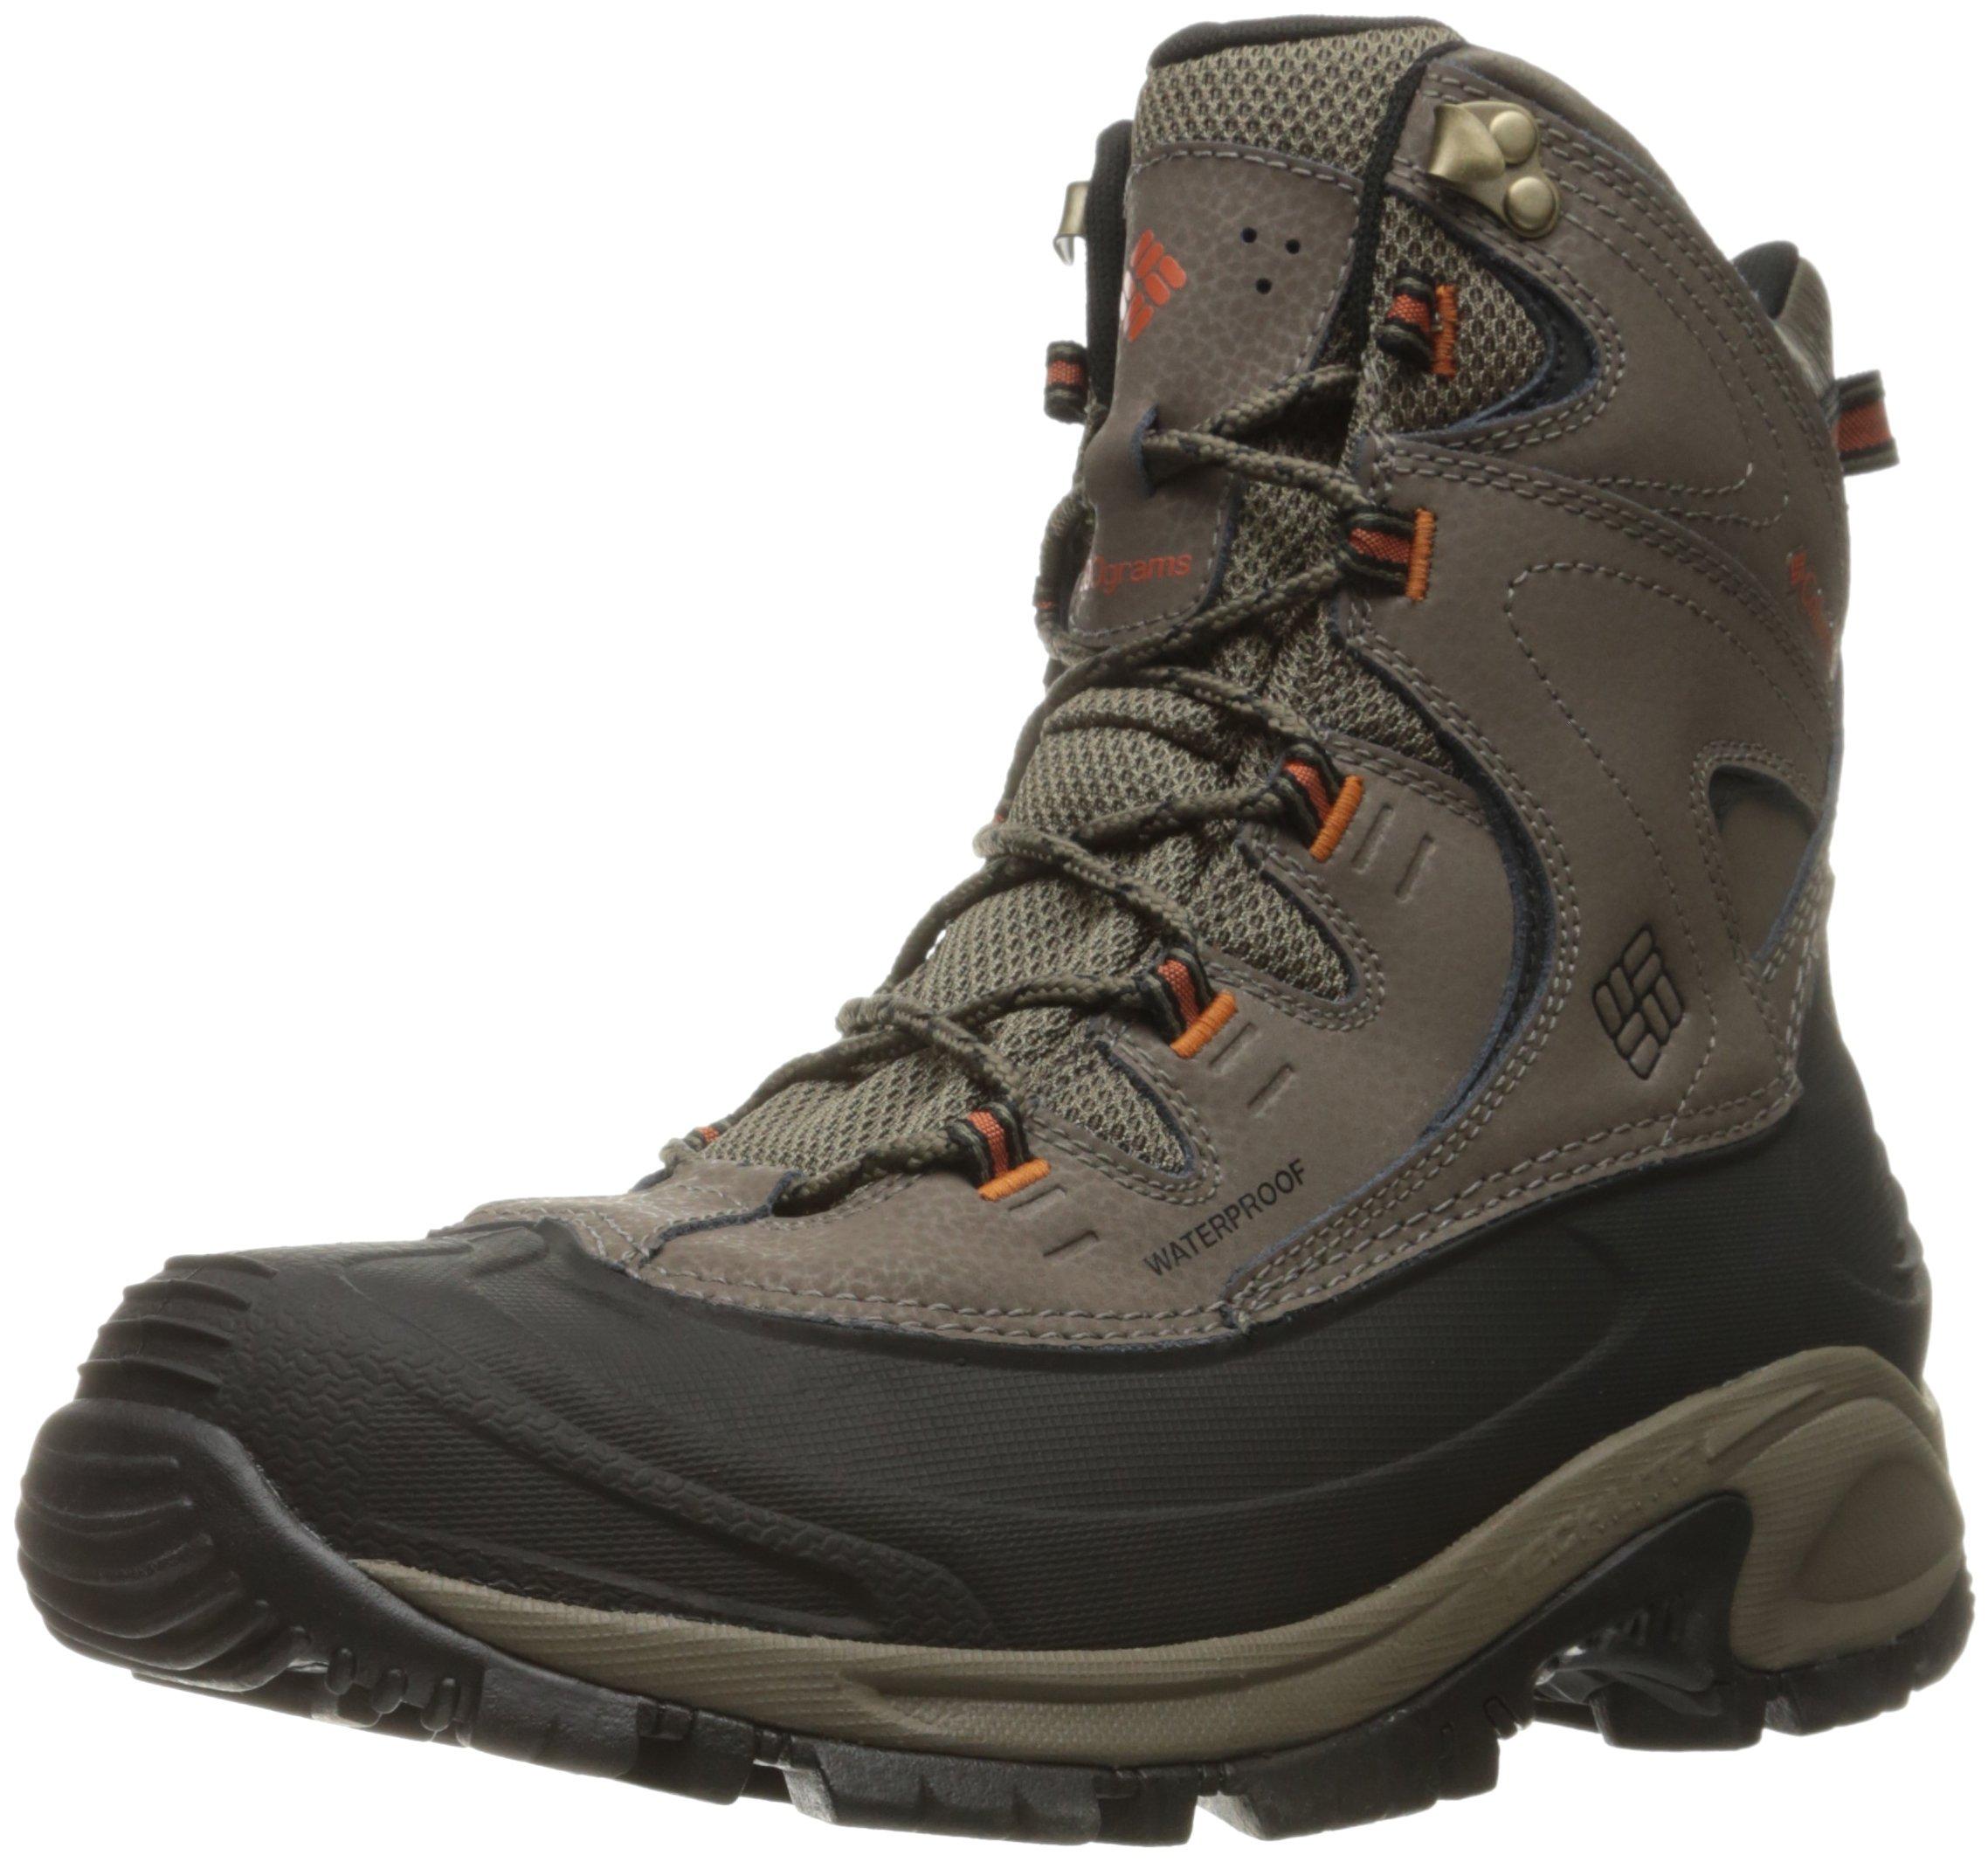 Columbia Boots: Amazon.com